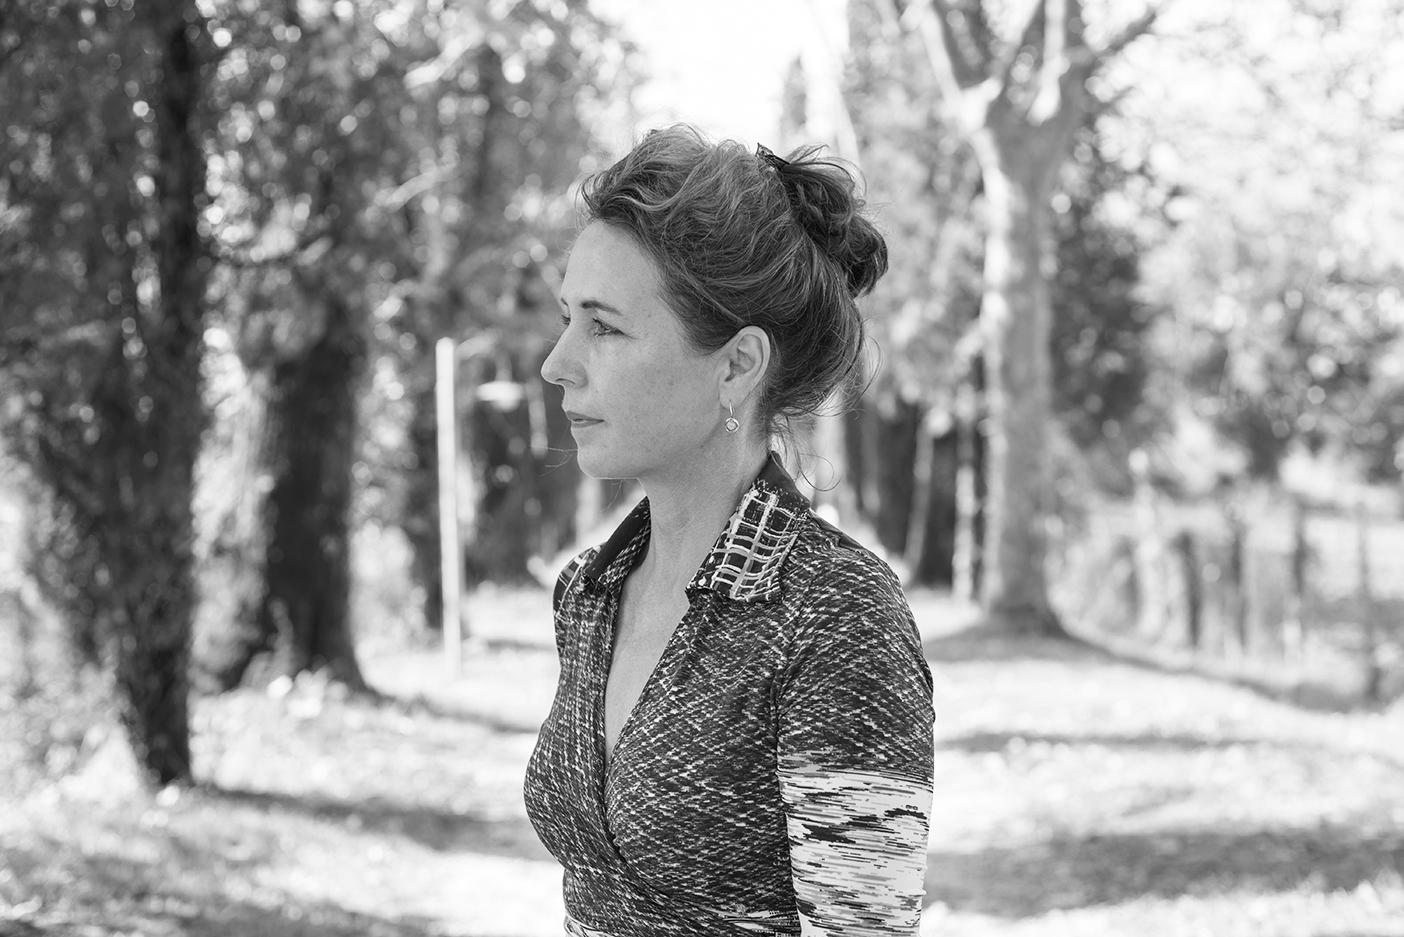 Margie Orford Judging New $50 000 International Literary Award